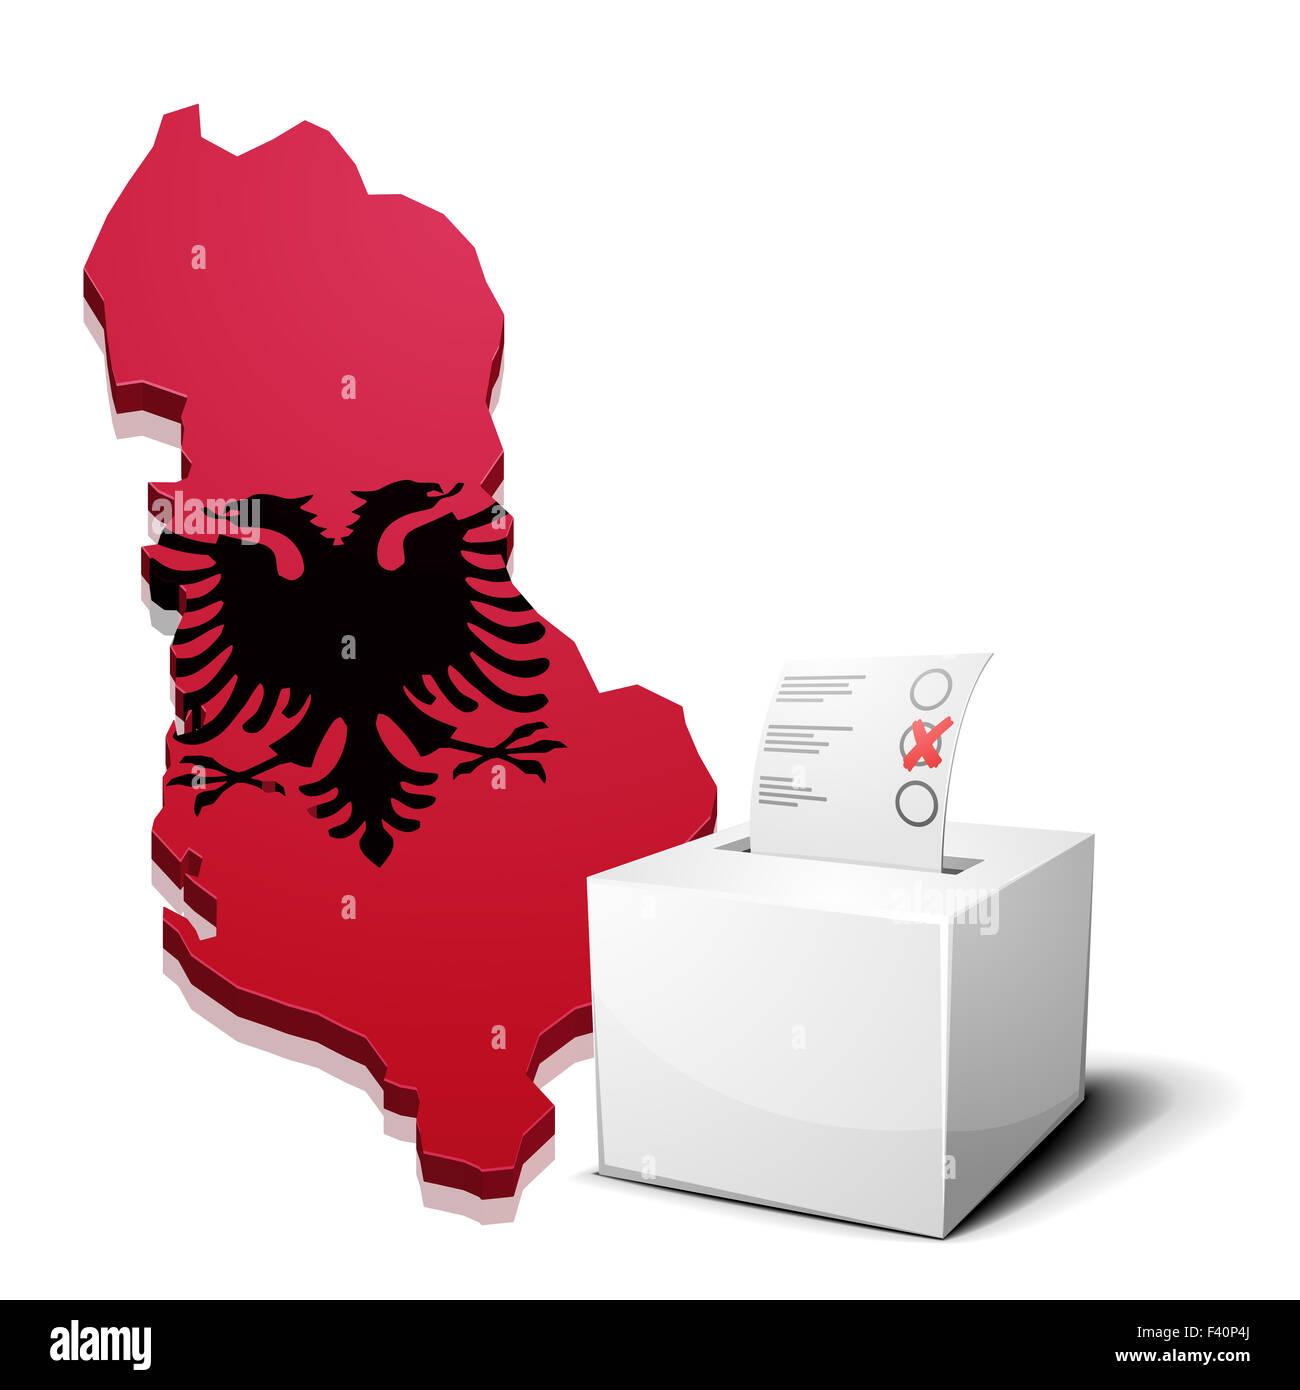 ballotbox Albania - Stock Image